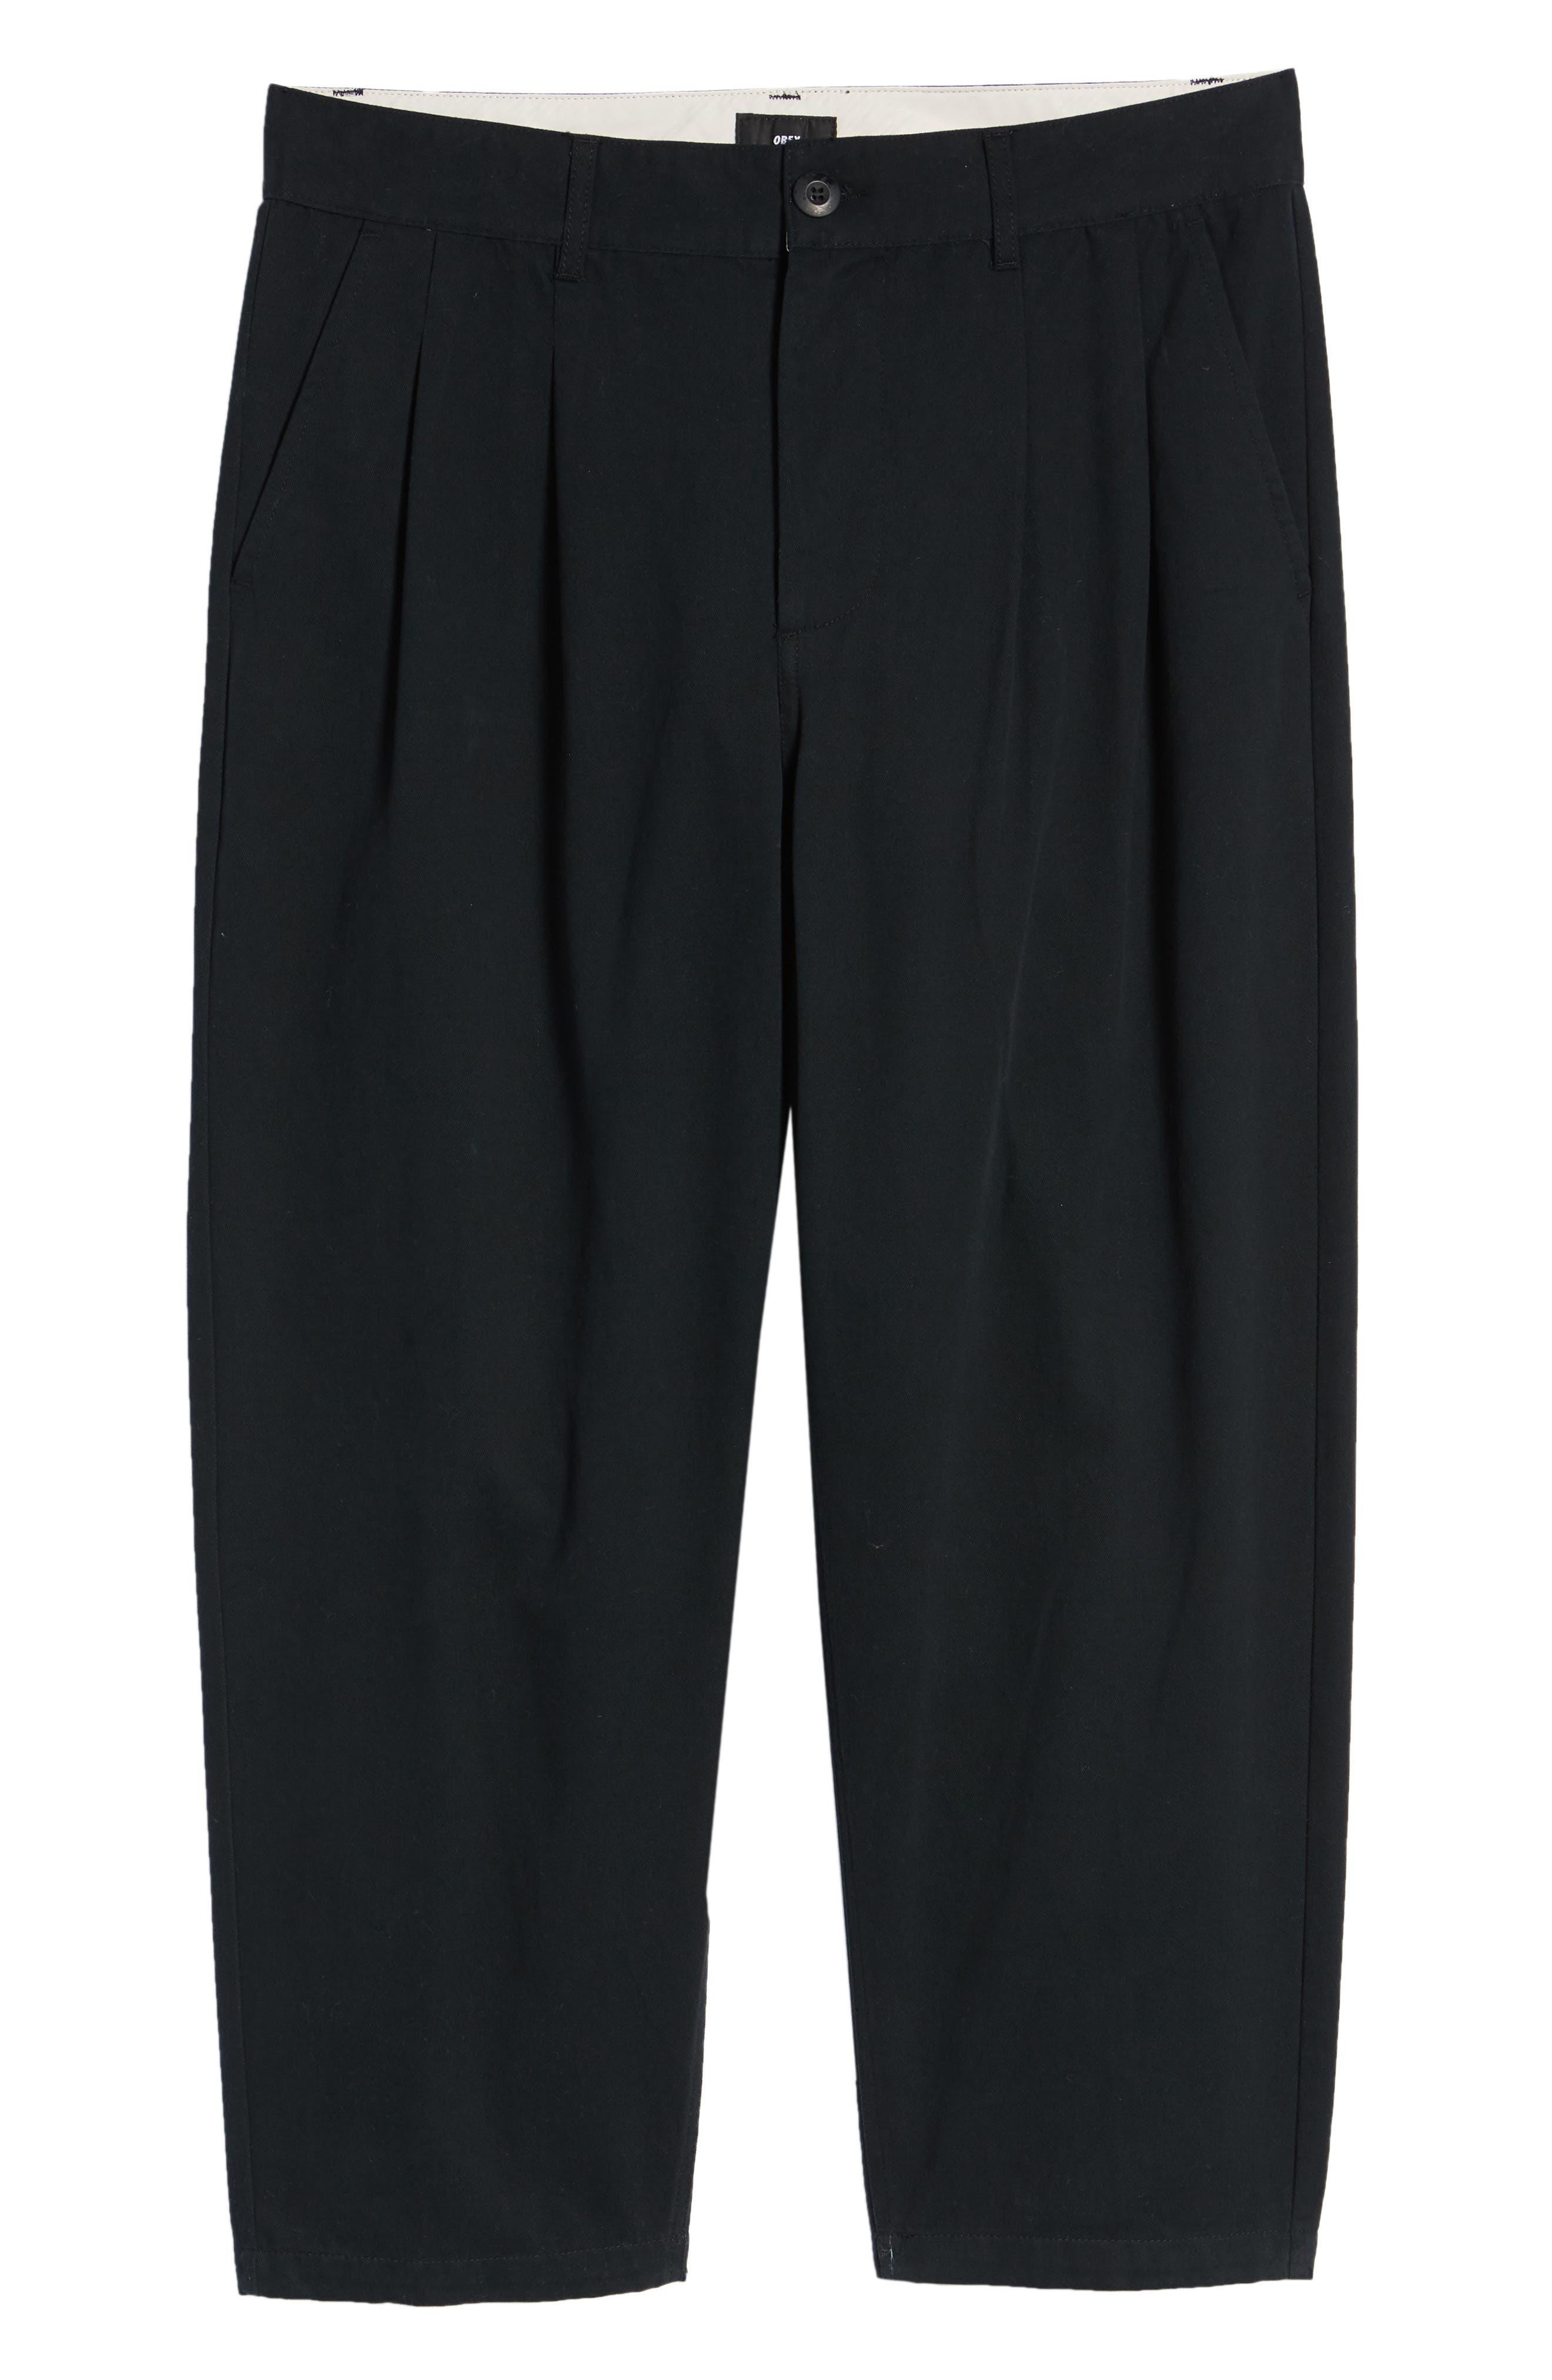 Fubar Pleated Relaxed Fit Pants,                             Alternate thumbnail 6, color,                             BLACK